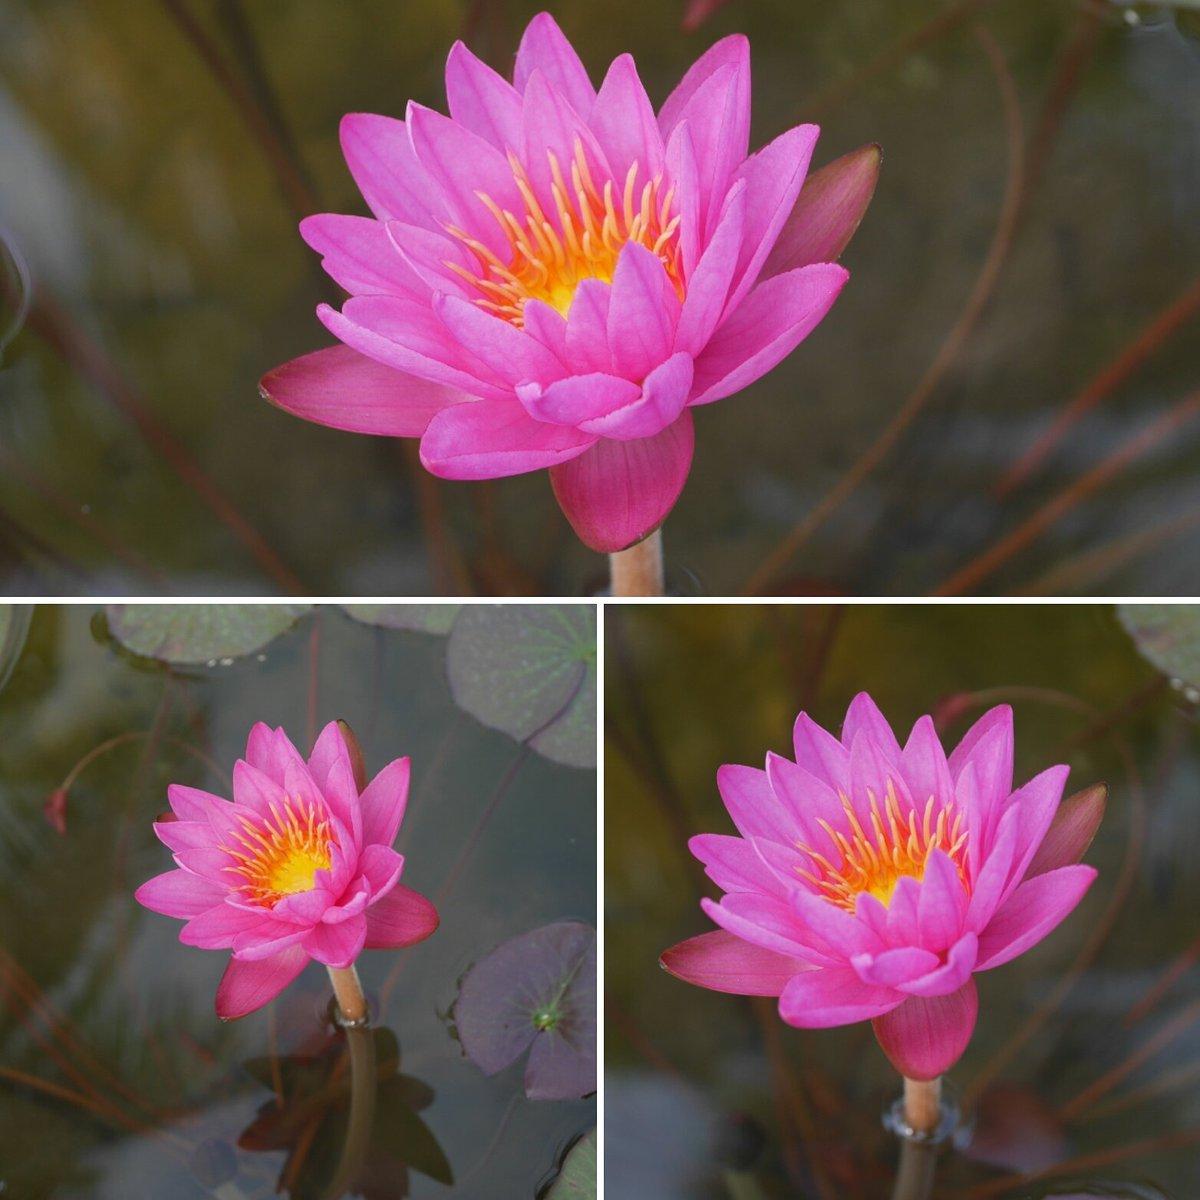 Waterlilies thailand on twitter hxt intersubgeneric waterlily homeandgarden thai waterlily wahgarden lotusflower lotos pondoflilies naturepicitterkgiic1wic5 izmirmasajfo